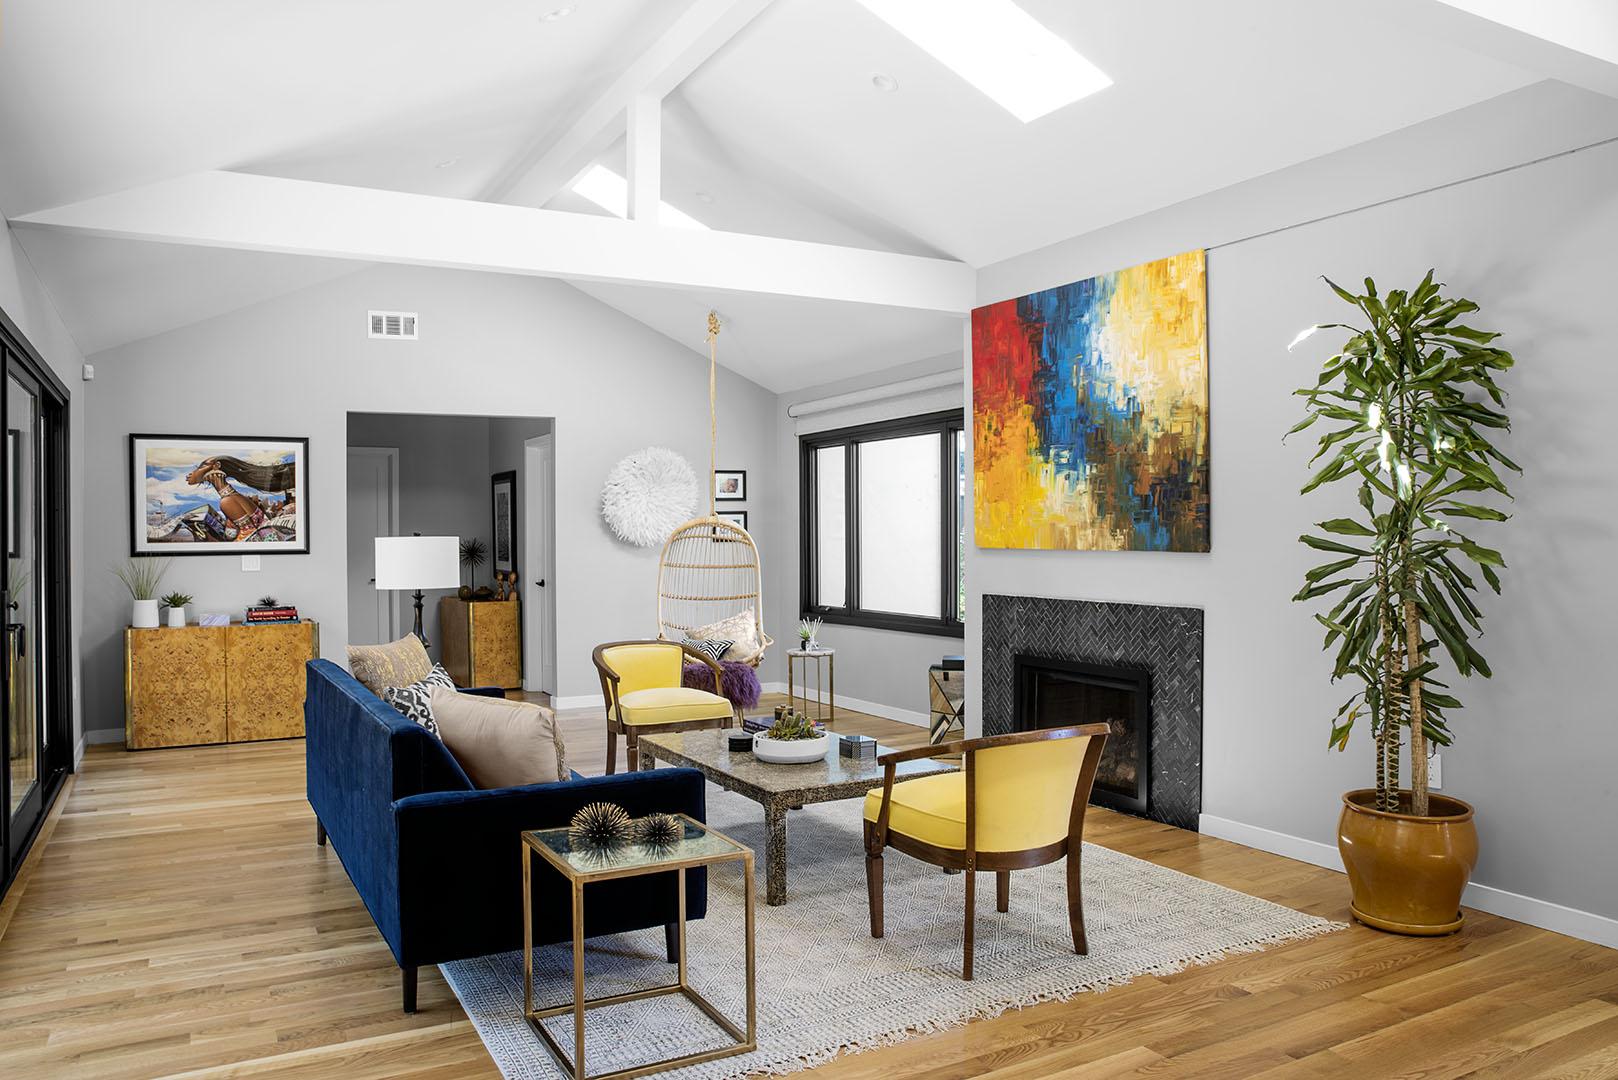 Living room interior design Oakland, CA